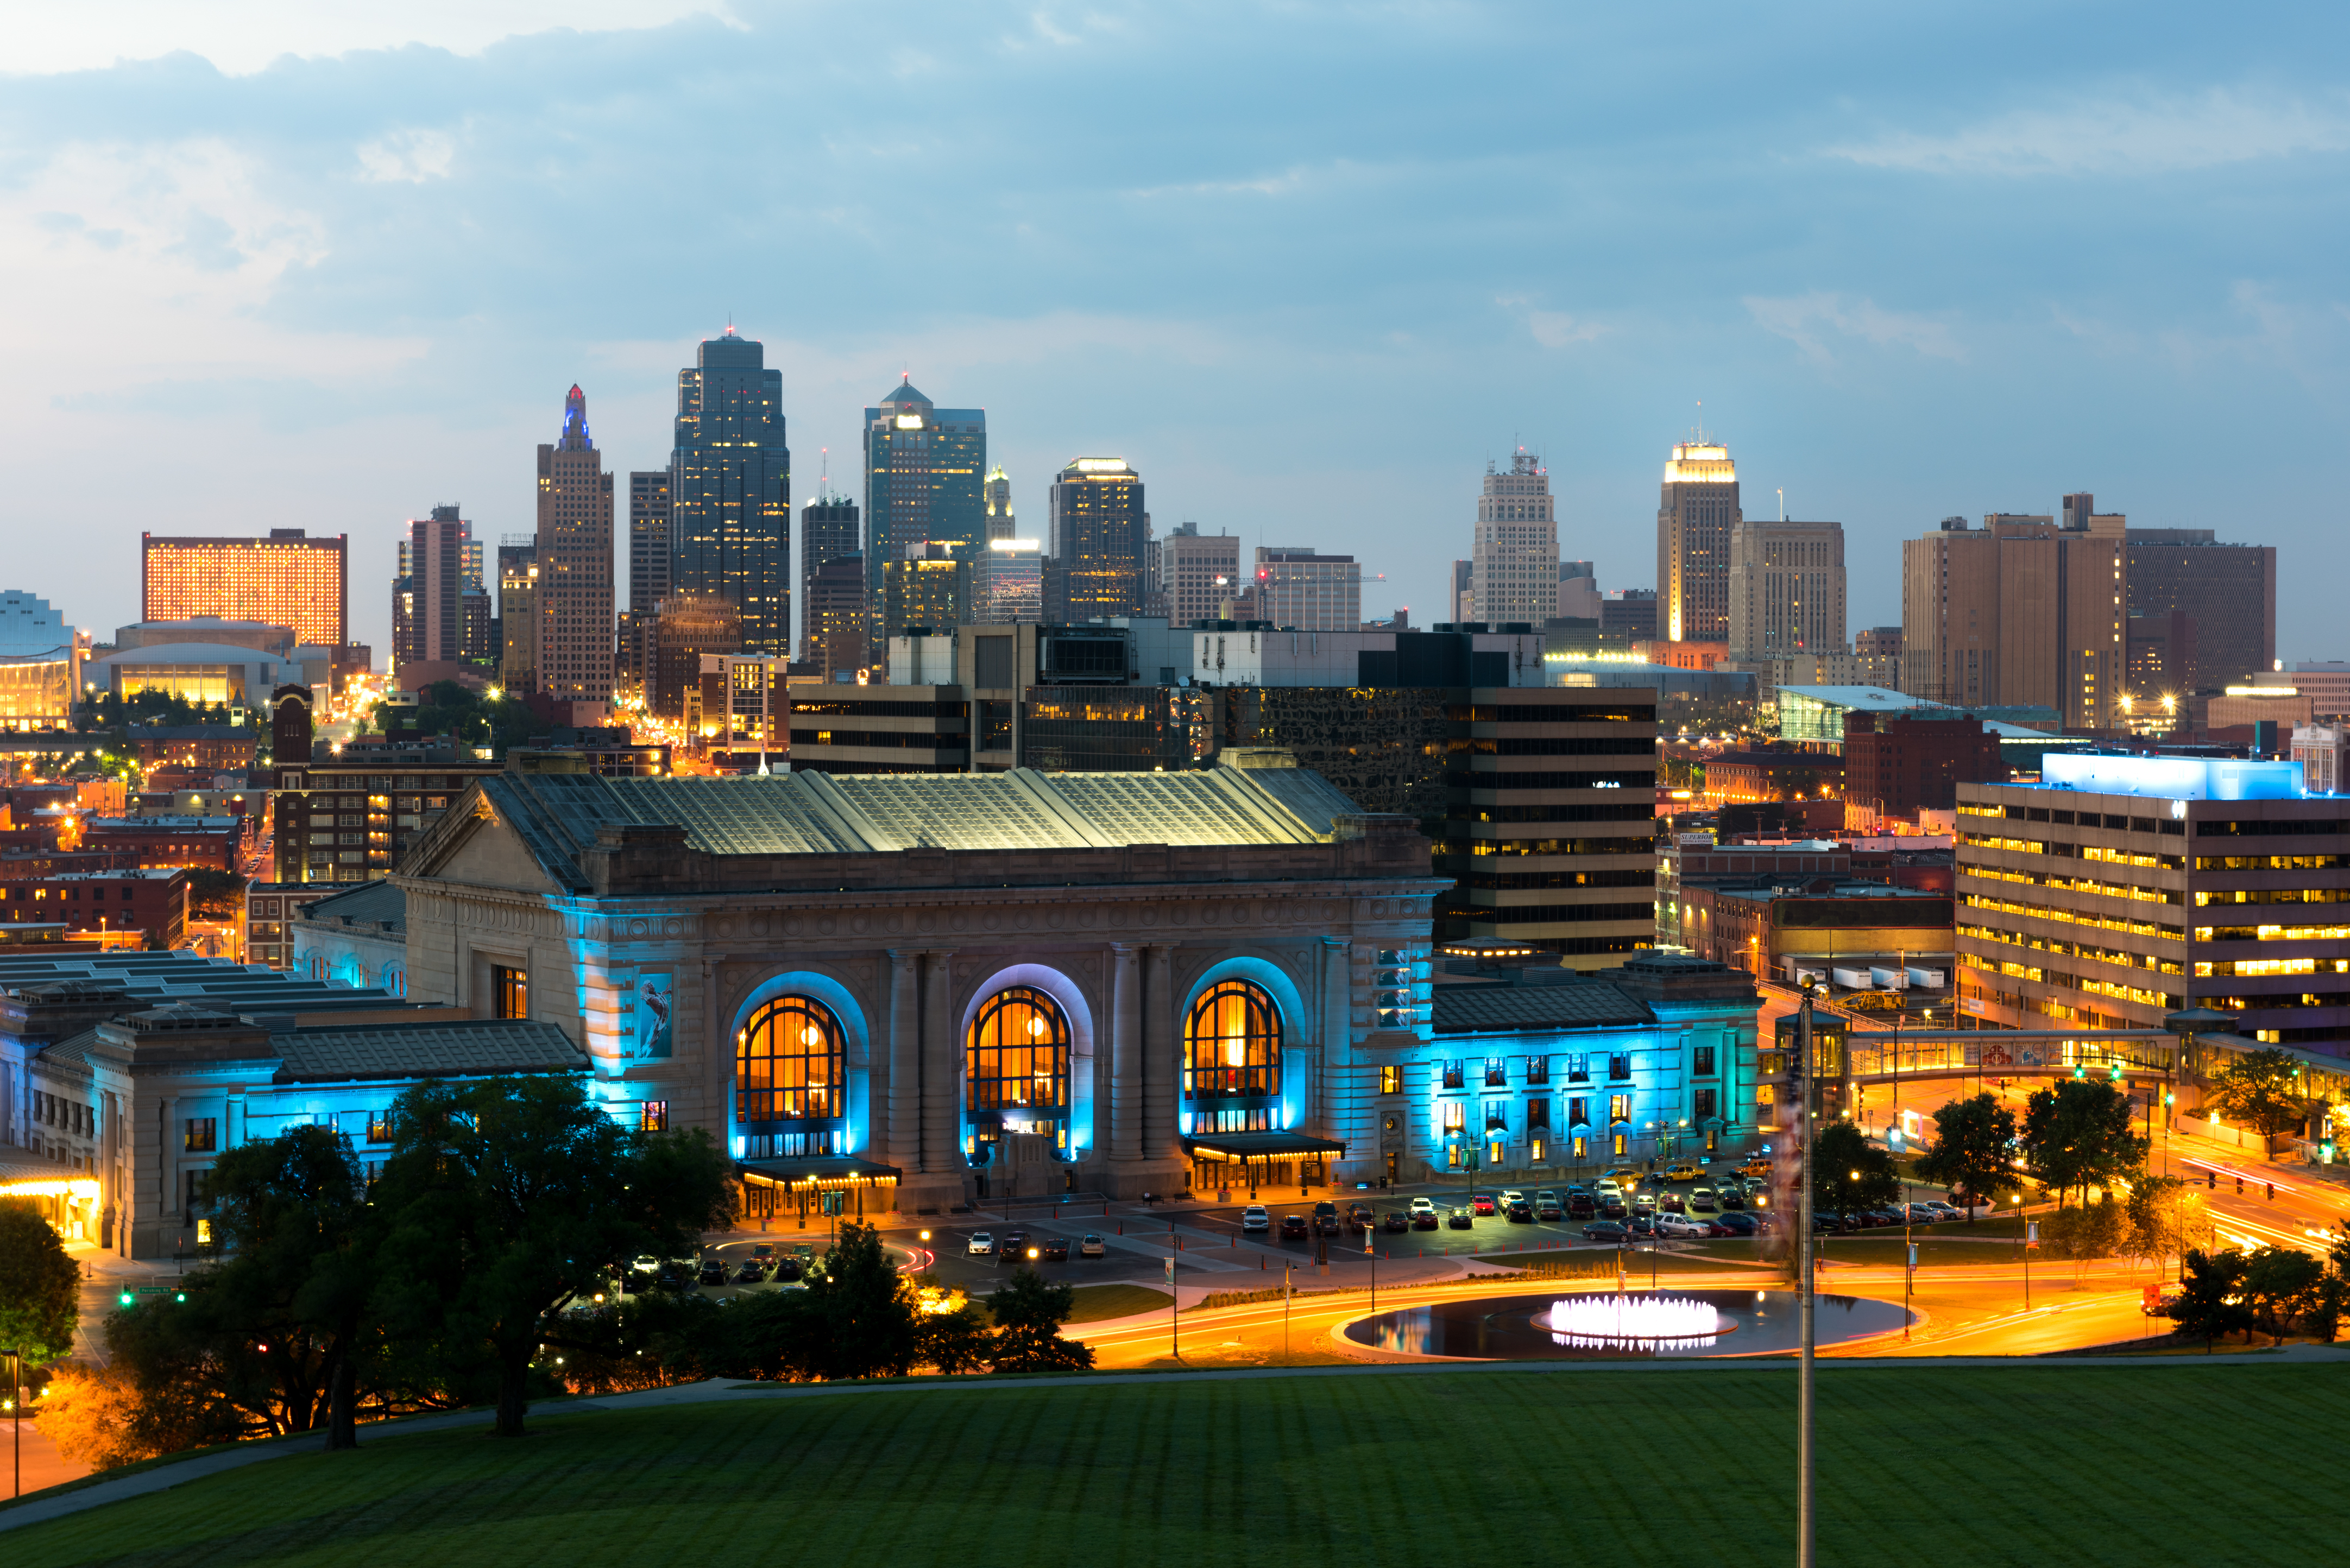 Tips on Kansas City Warnings or Dangers - Stay Safe